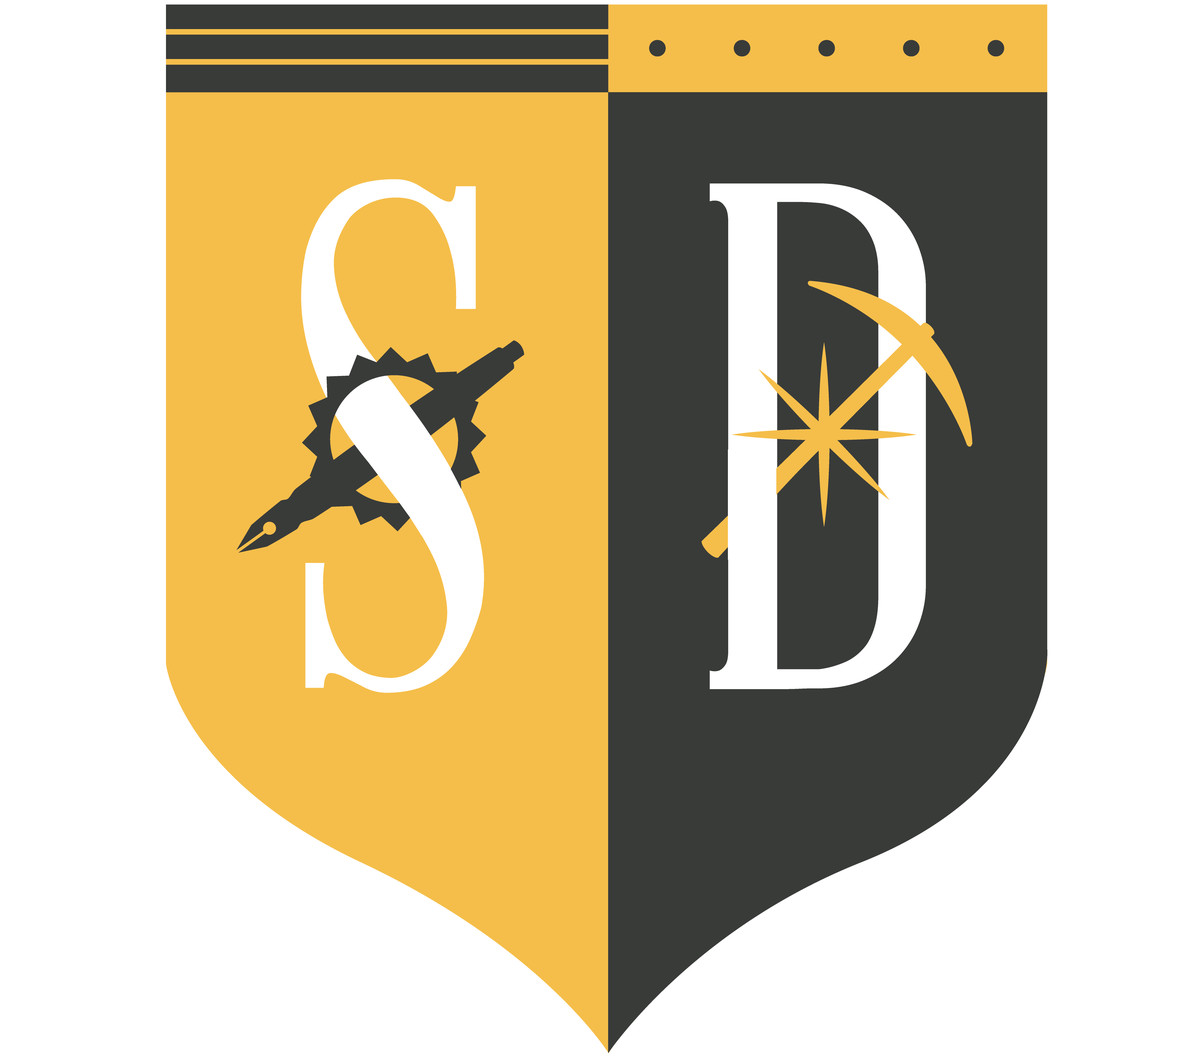 Sunfield & Deatic crest